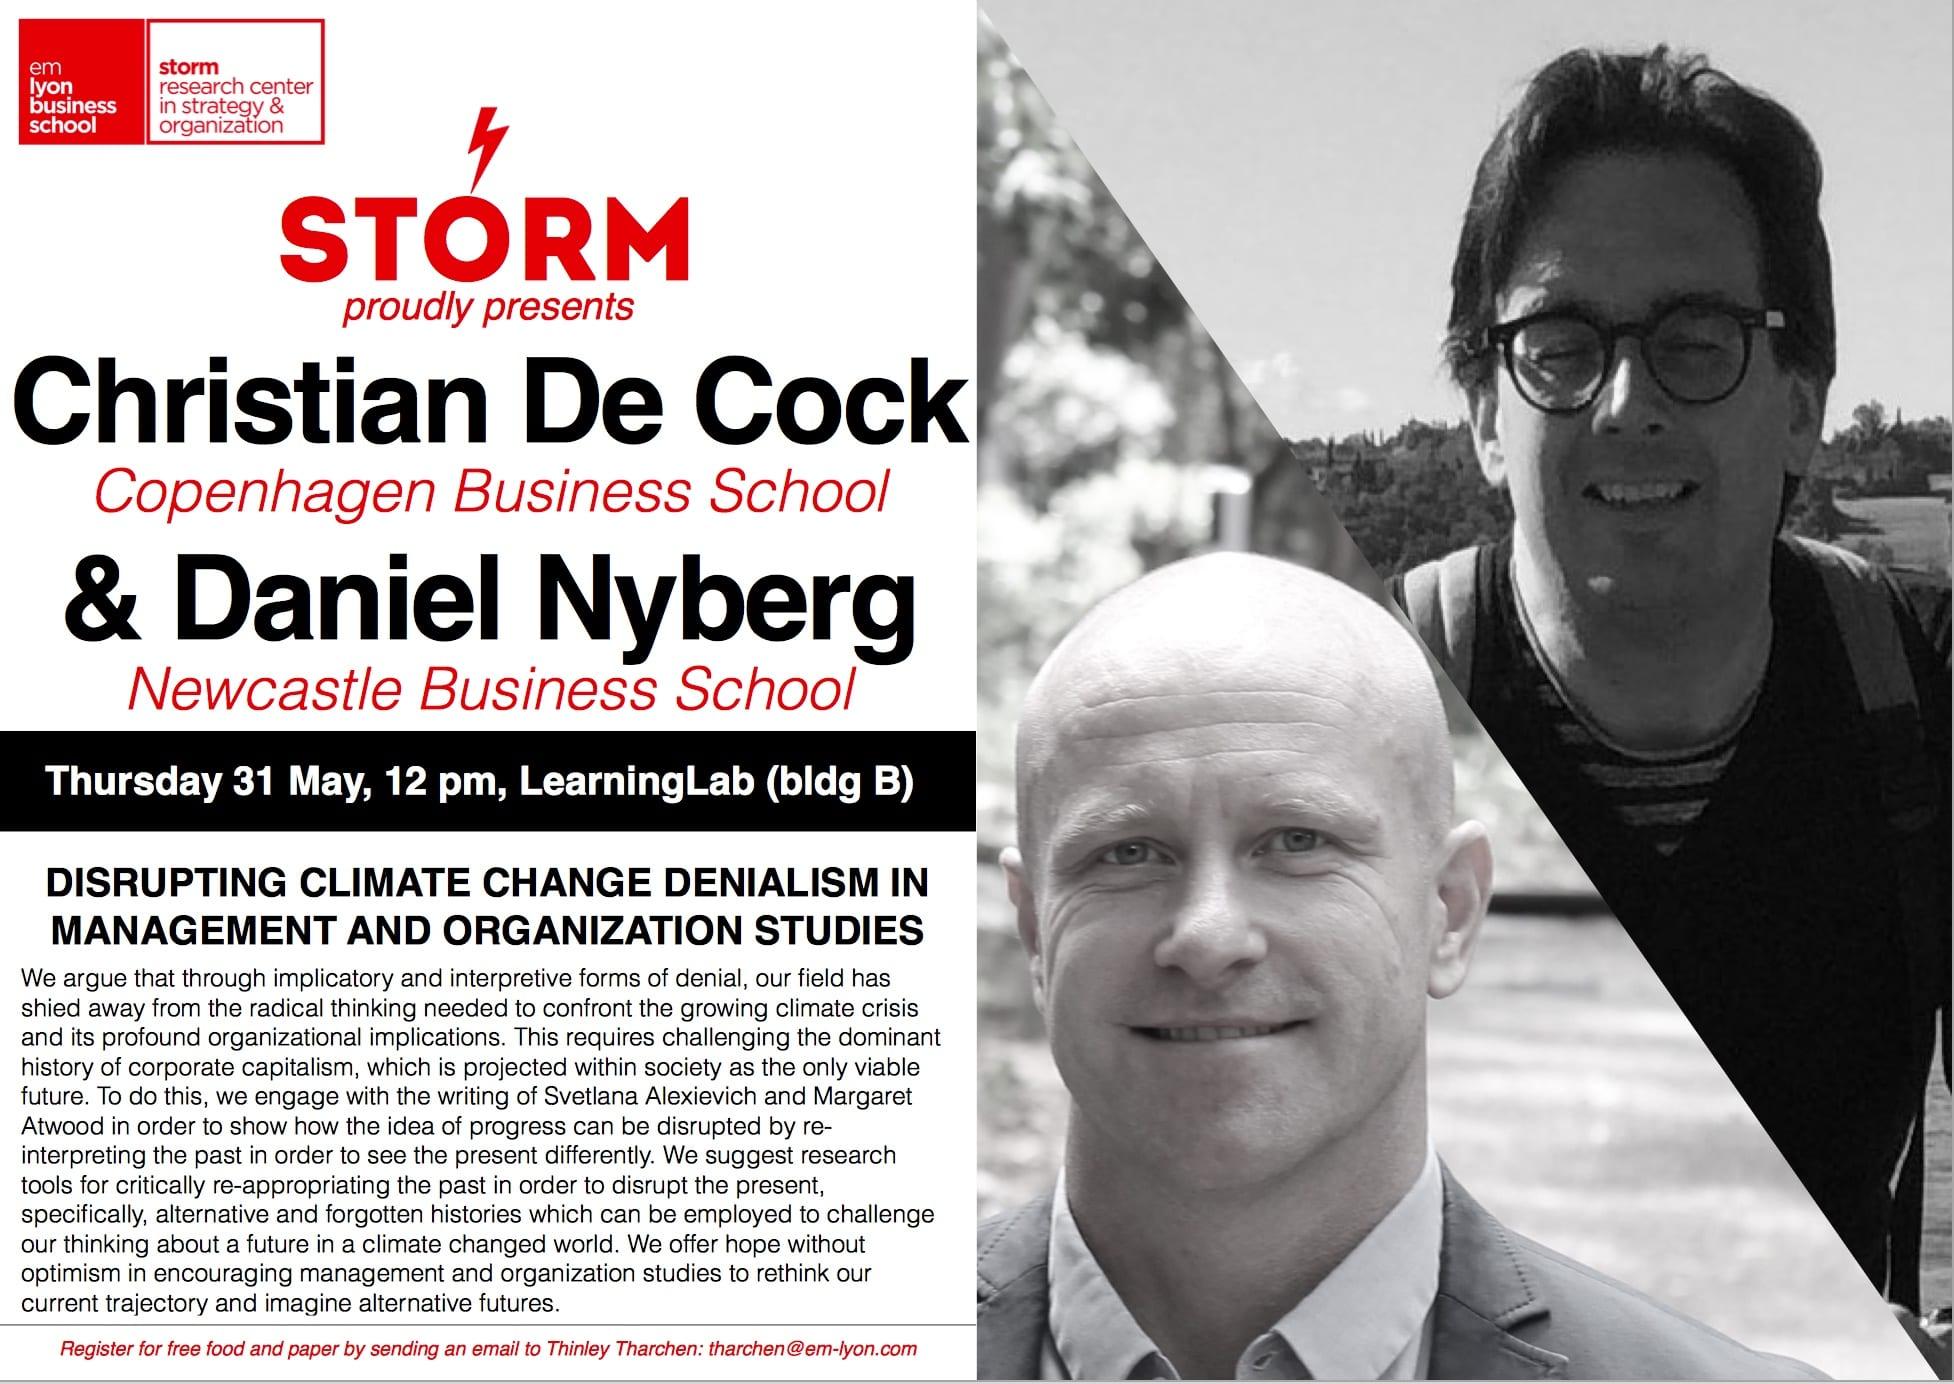 31 May 2018: CHRISTIAN DE COCK (CBS) & DANIEL NYBERG (Newcastle)